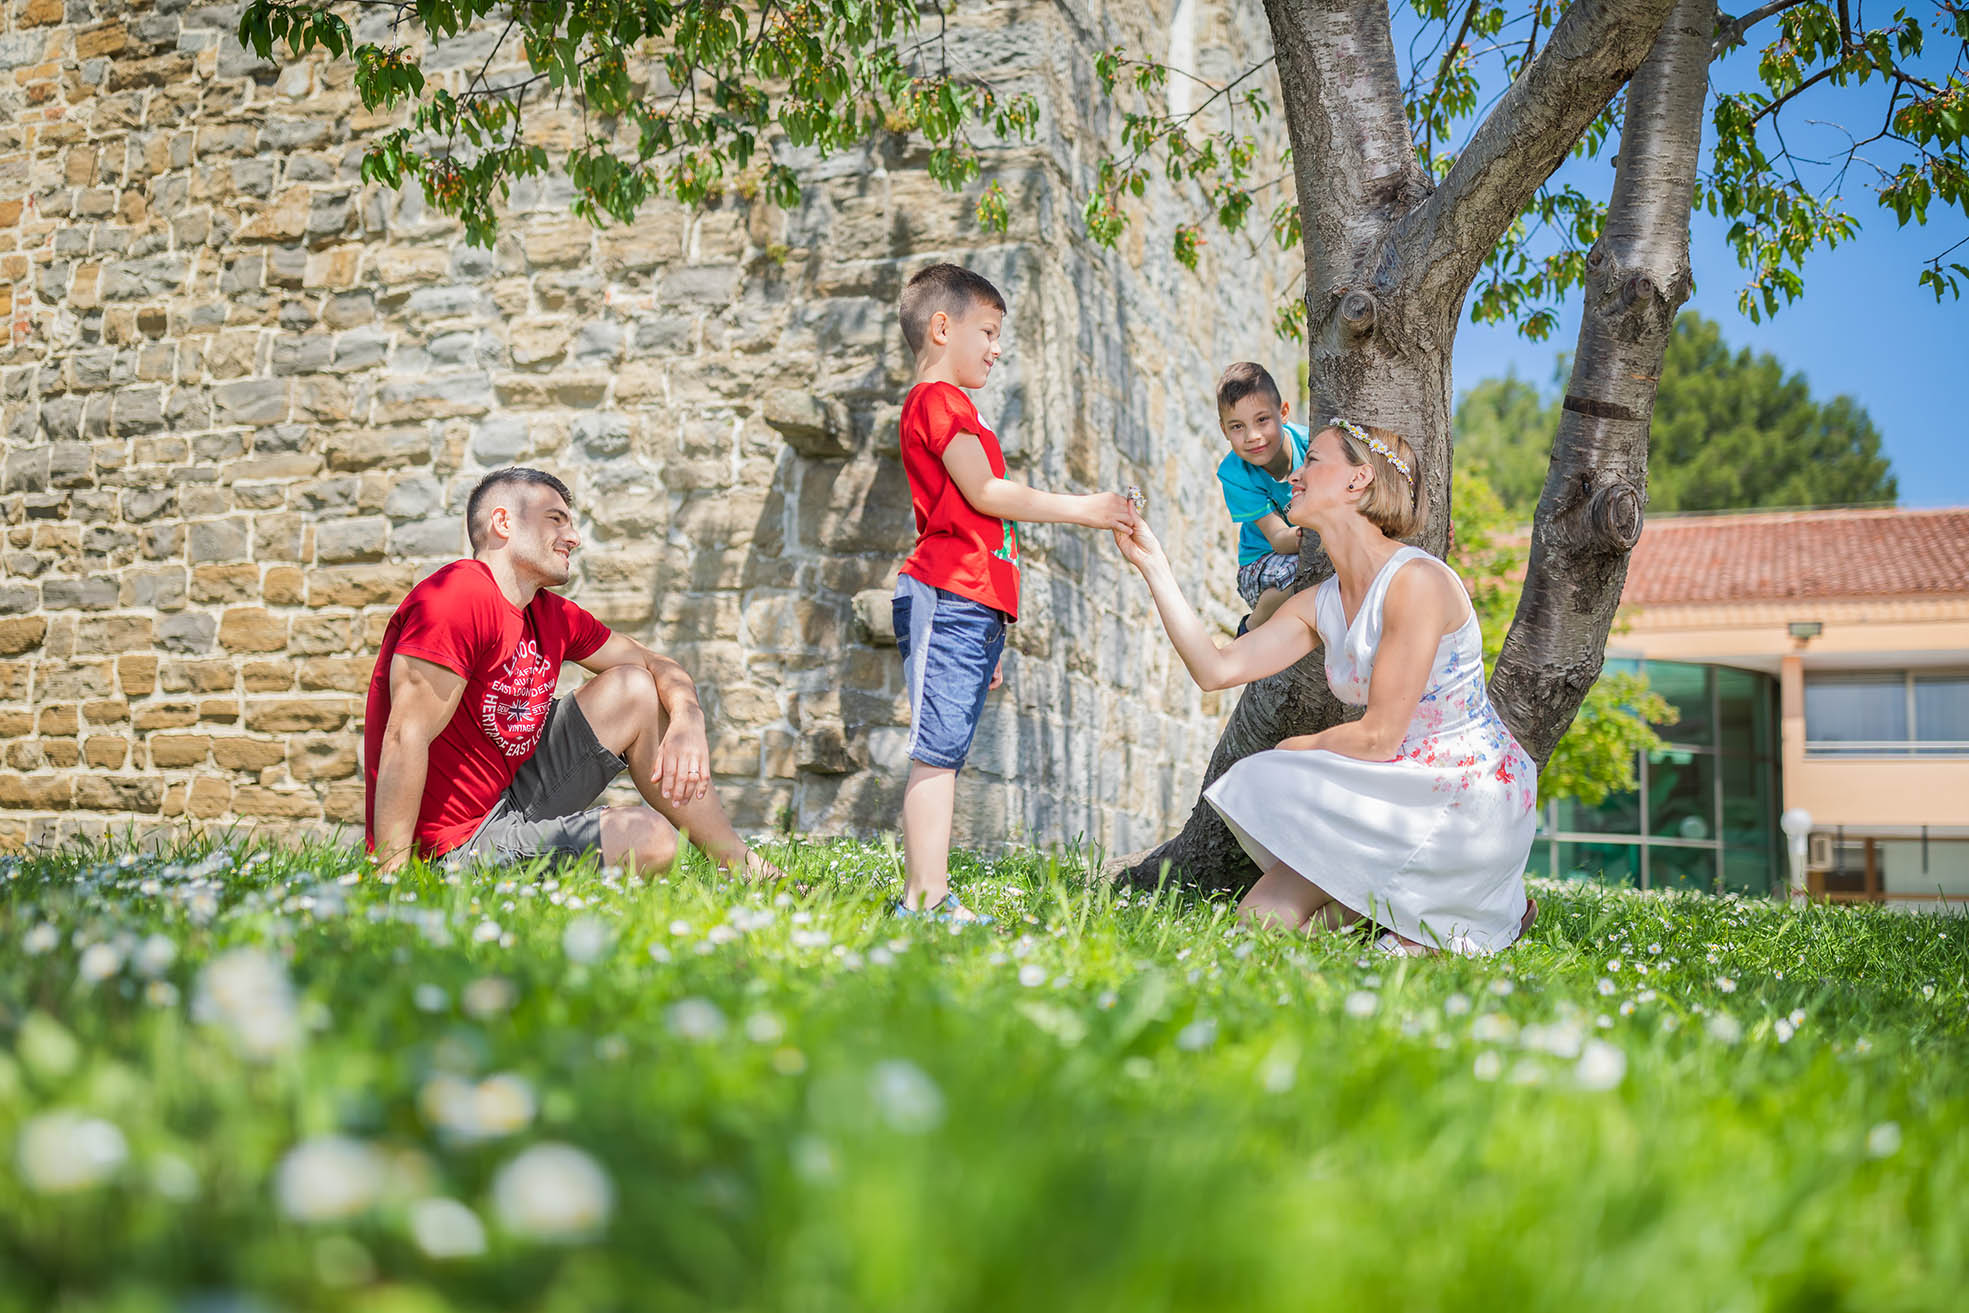 Family by St.Bernardin church_SBP_02_Photo_JI_junij 2019_lowres